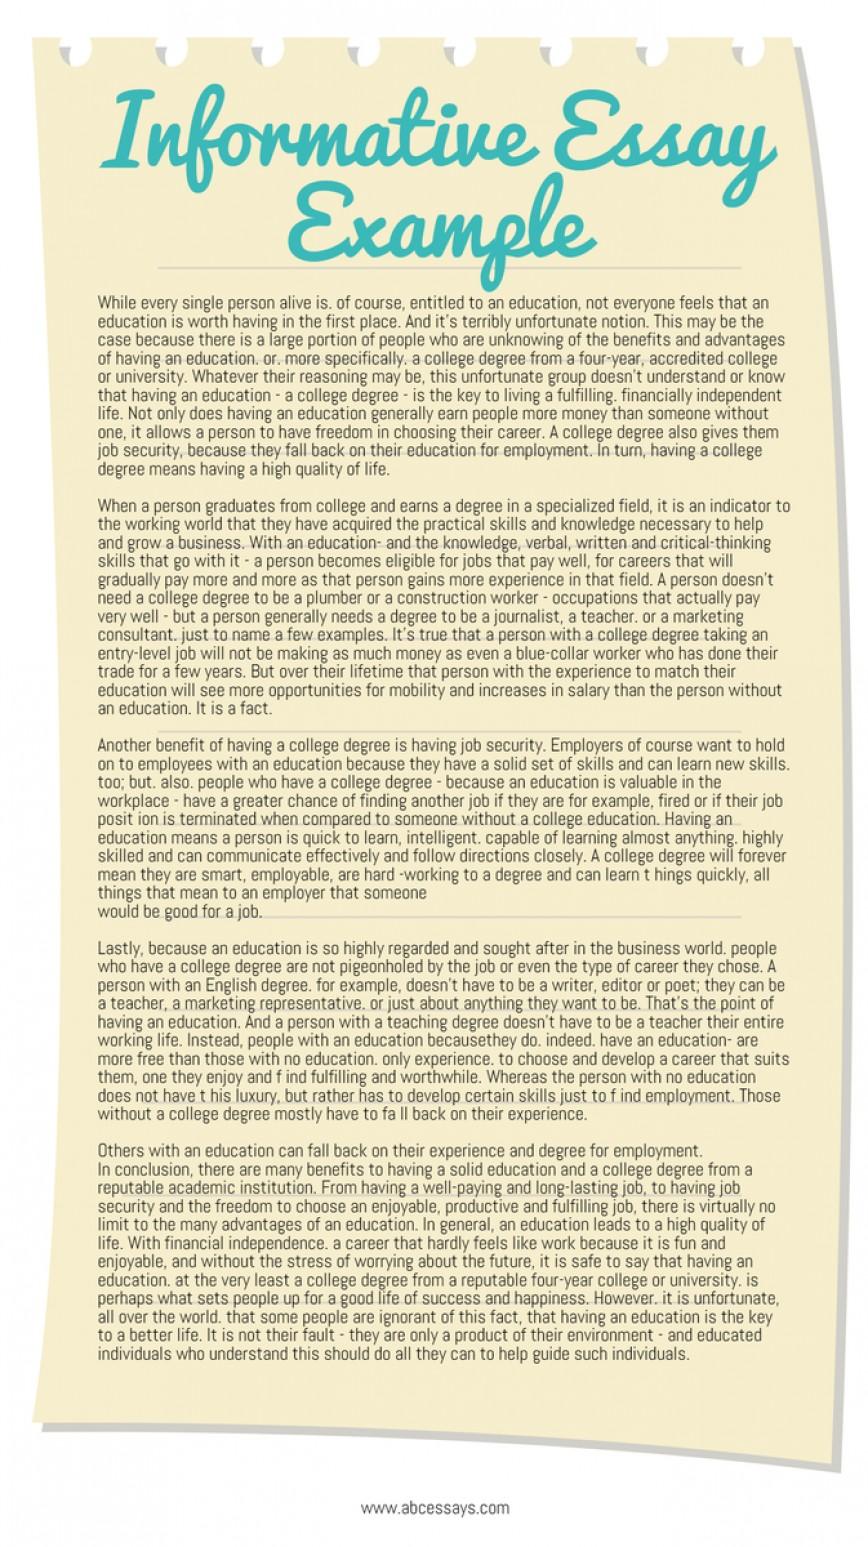 010 Cj8yymmwsaaz6h5 Informative Essay Impressive Example Examples 5th Grade Pdf High School